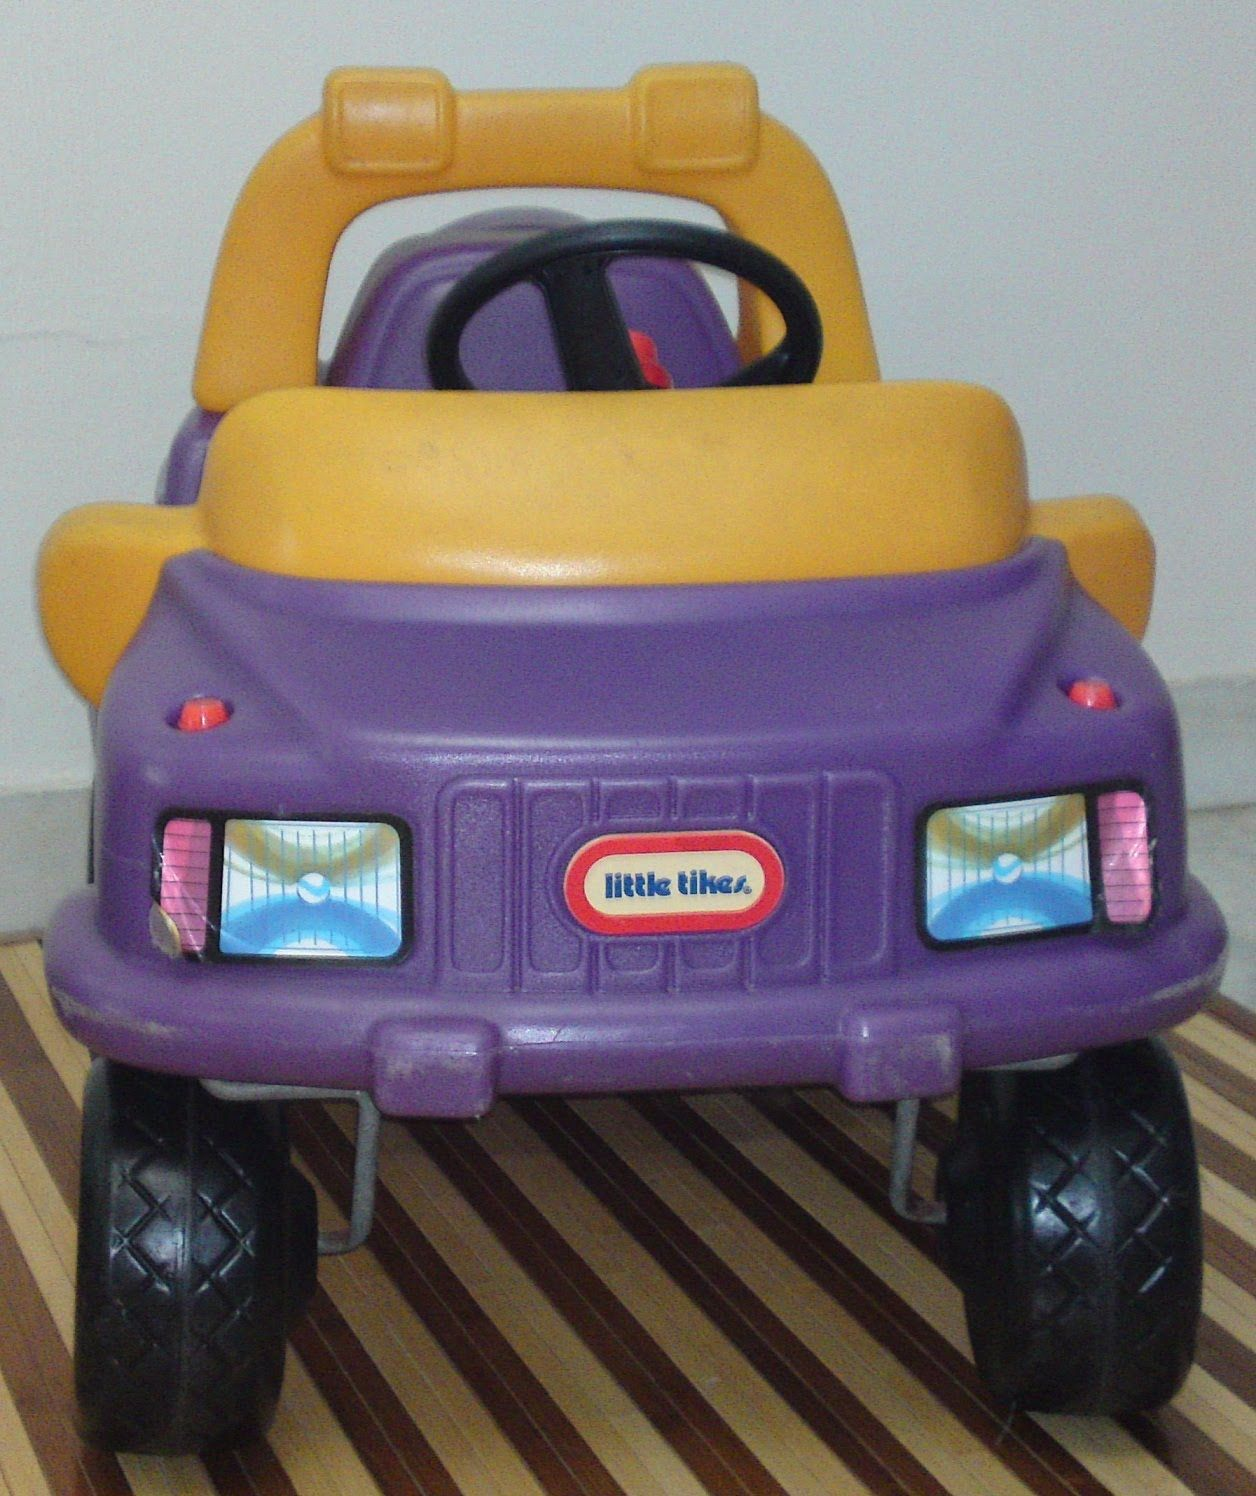 Little Tikes 4X4 Jeep Little tikes, Future kids, Fisher